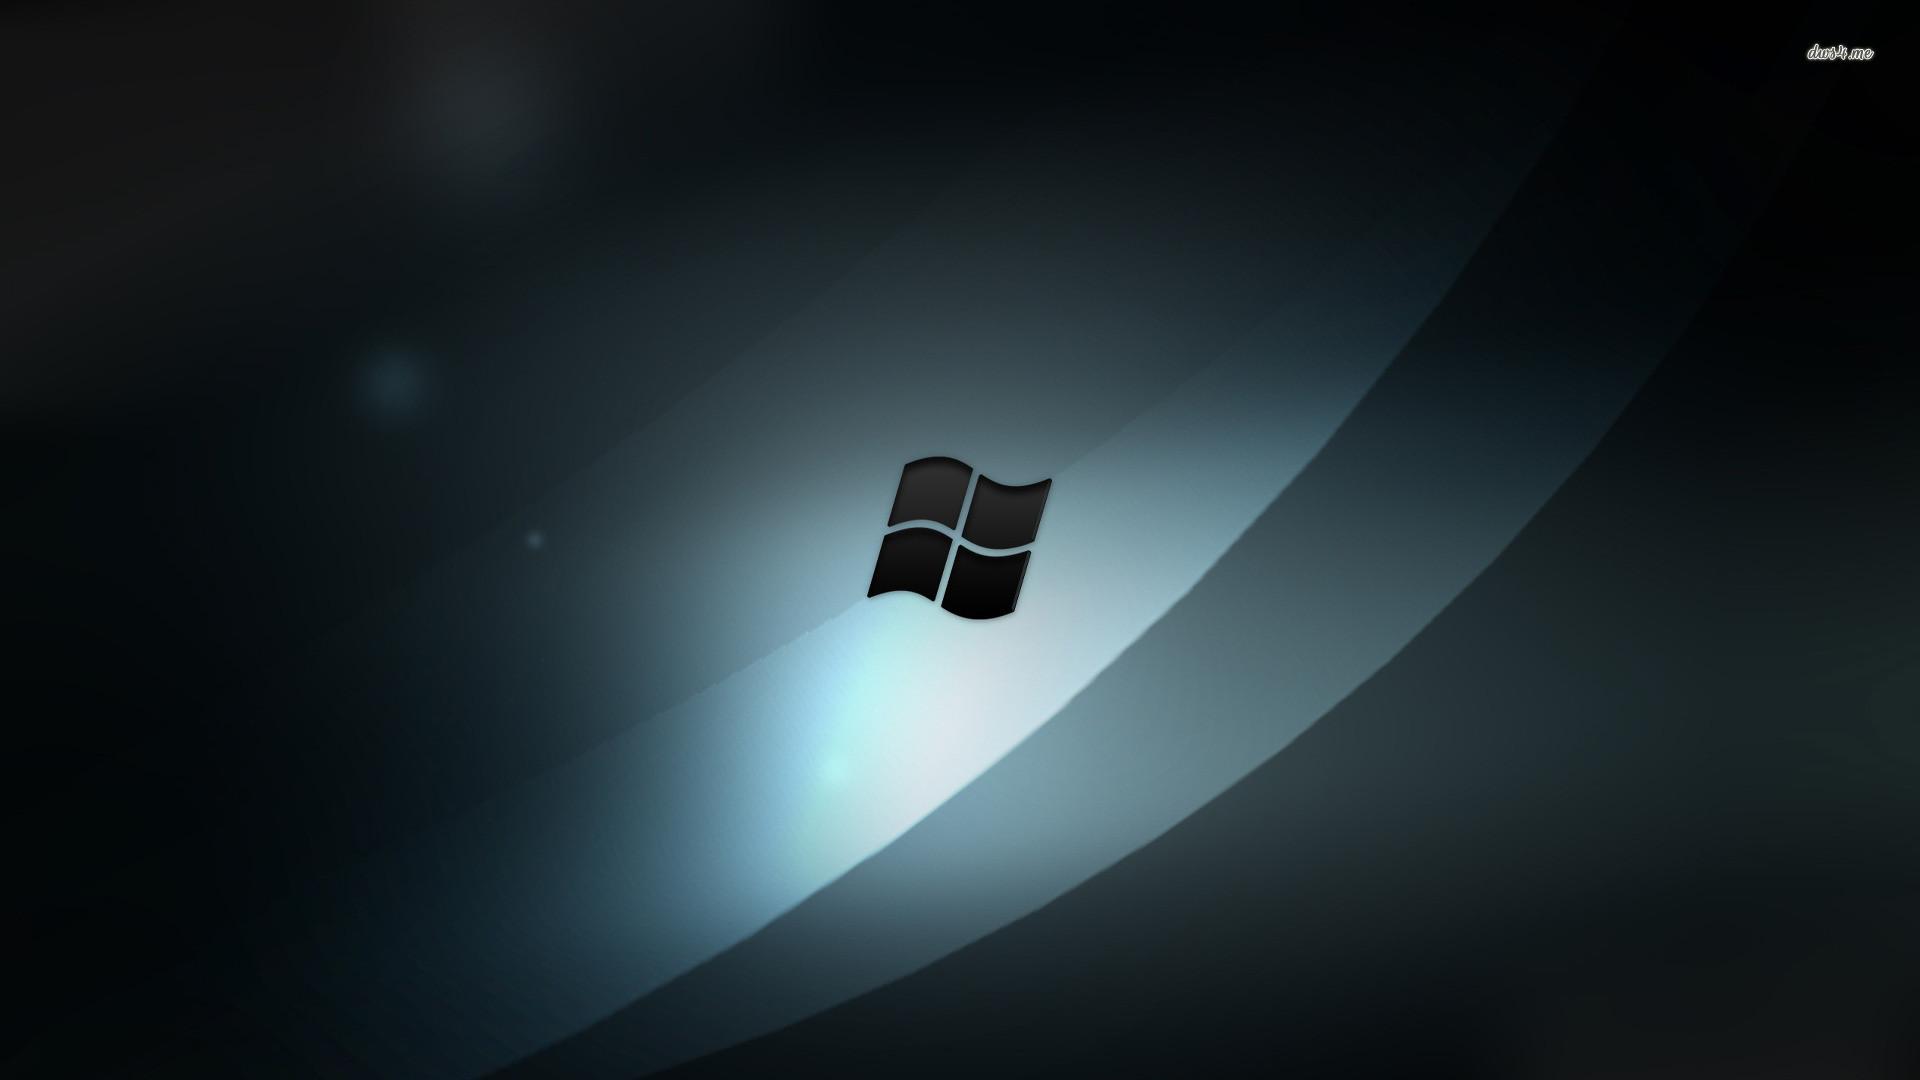 Windows HD Desktop Wallpapers for Wallpapers Windows